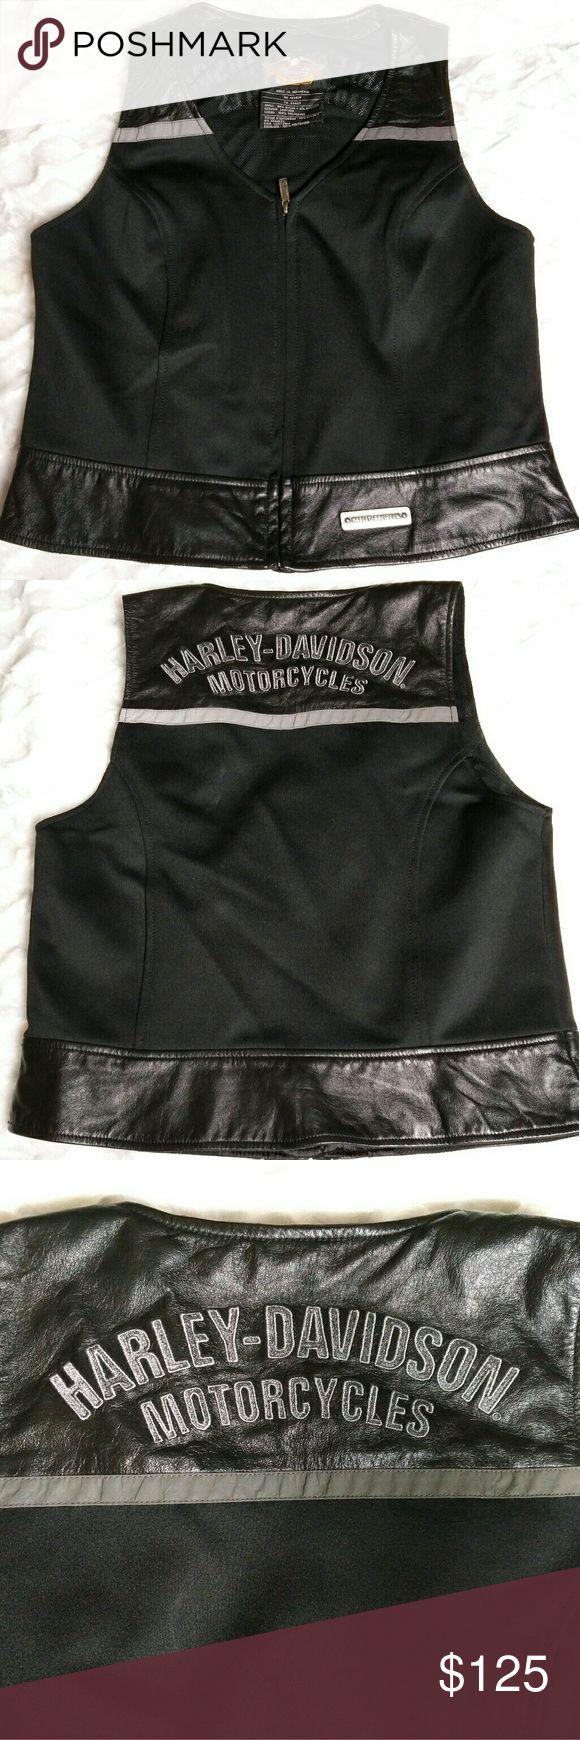 Harley Davidson Vest Fabulous Harley Davidson vest combo material, Shell 96% Nylon 4% Spandex, Genuine Leather trim, & 100% Polyester. Harley Davidson Jackets & Coats Vests